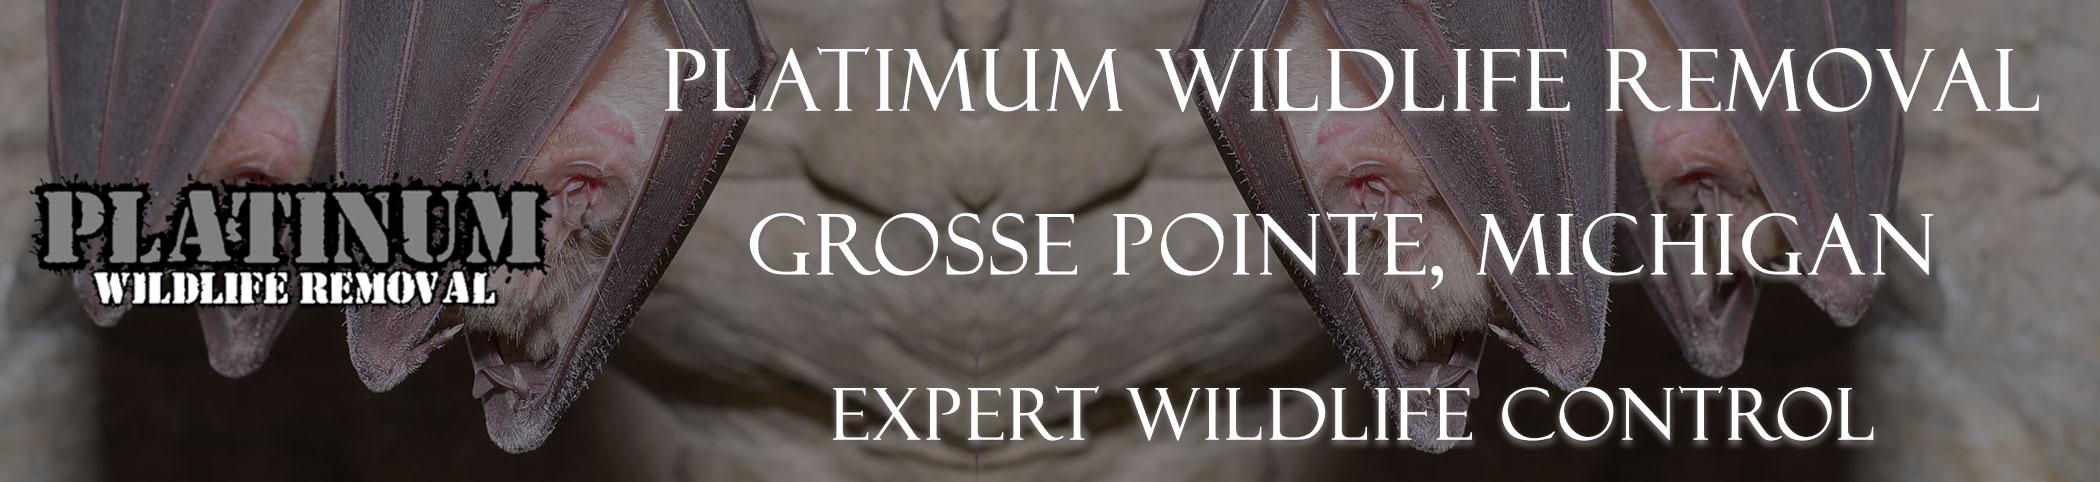 Grosse-Pointe-Platinum-Wildlife-Removal-michgan